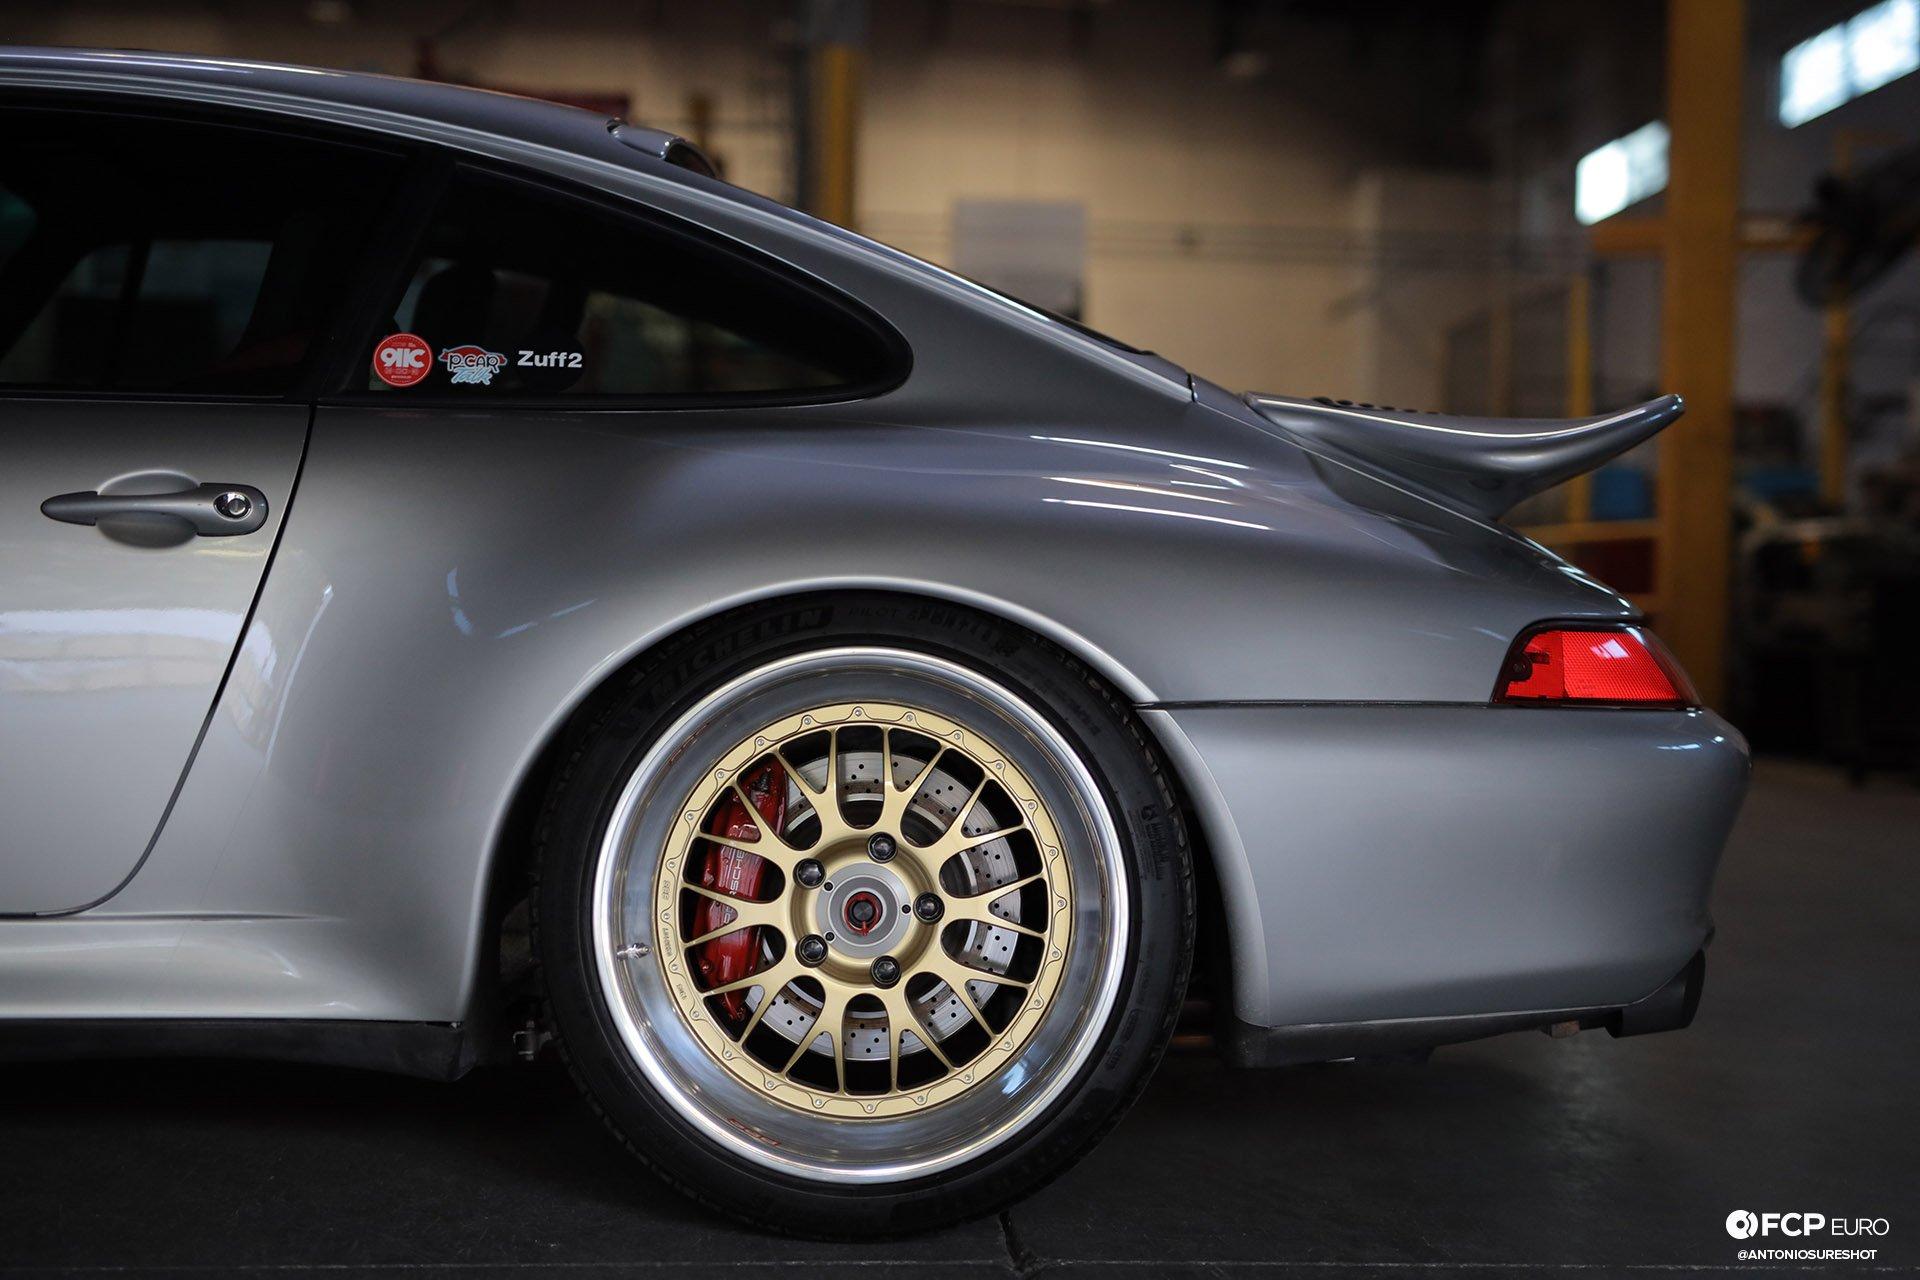 Zuffenhausen 993 Porsche 911 BBS Wheels Recaro EOSR9984